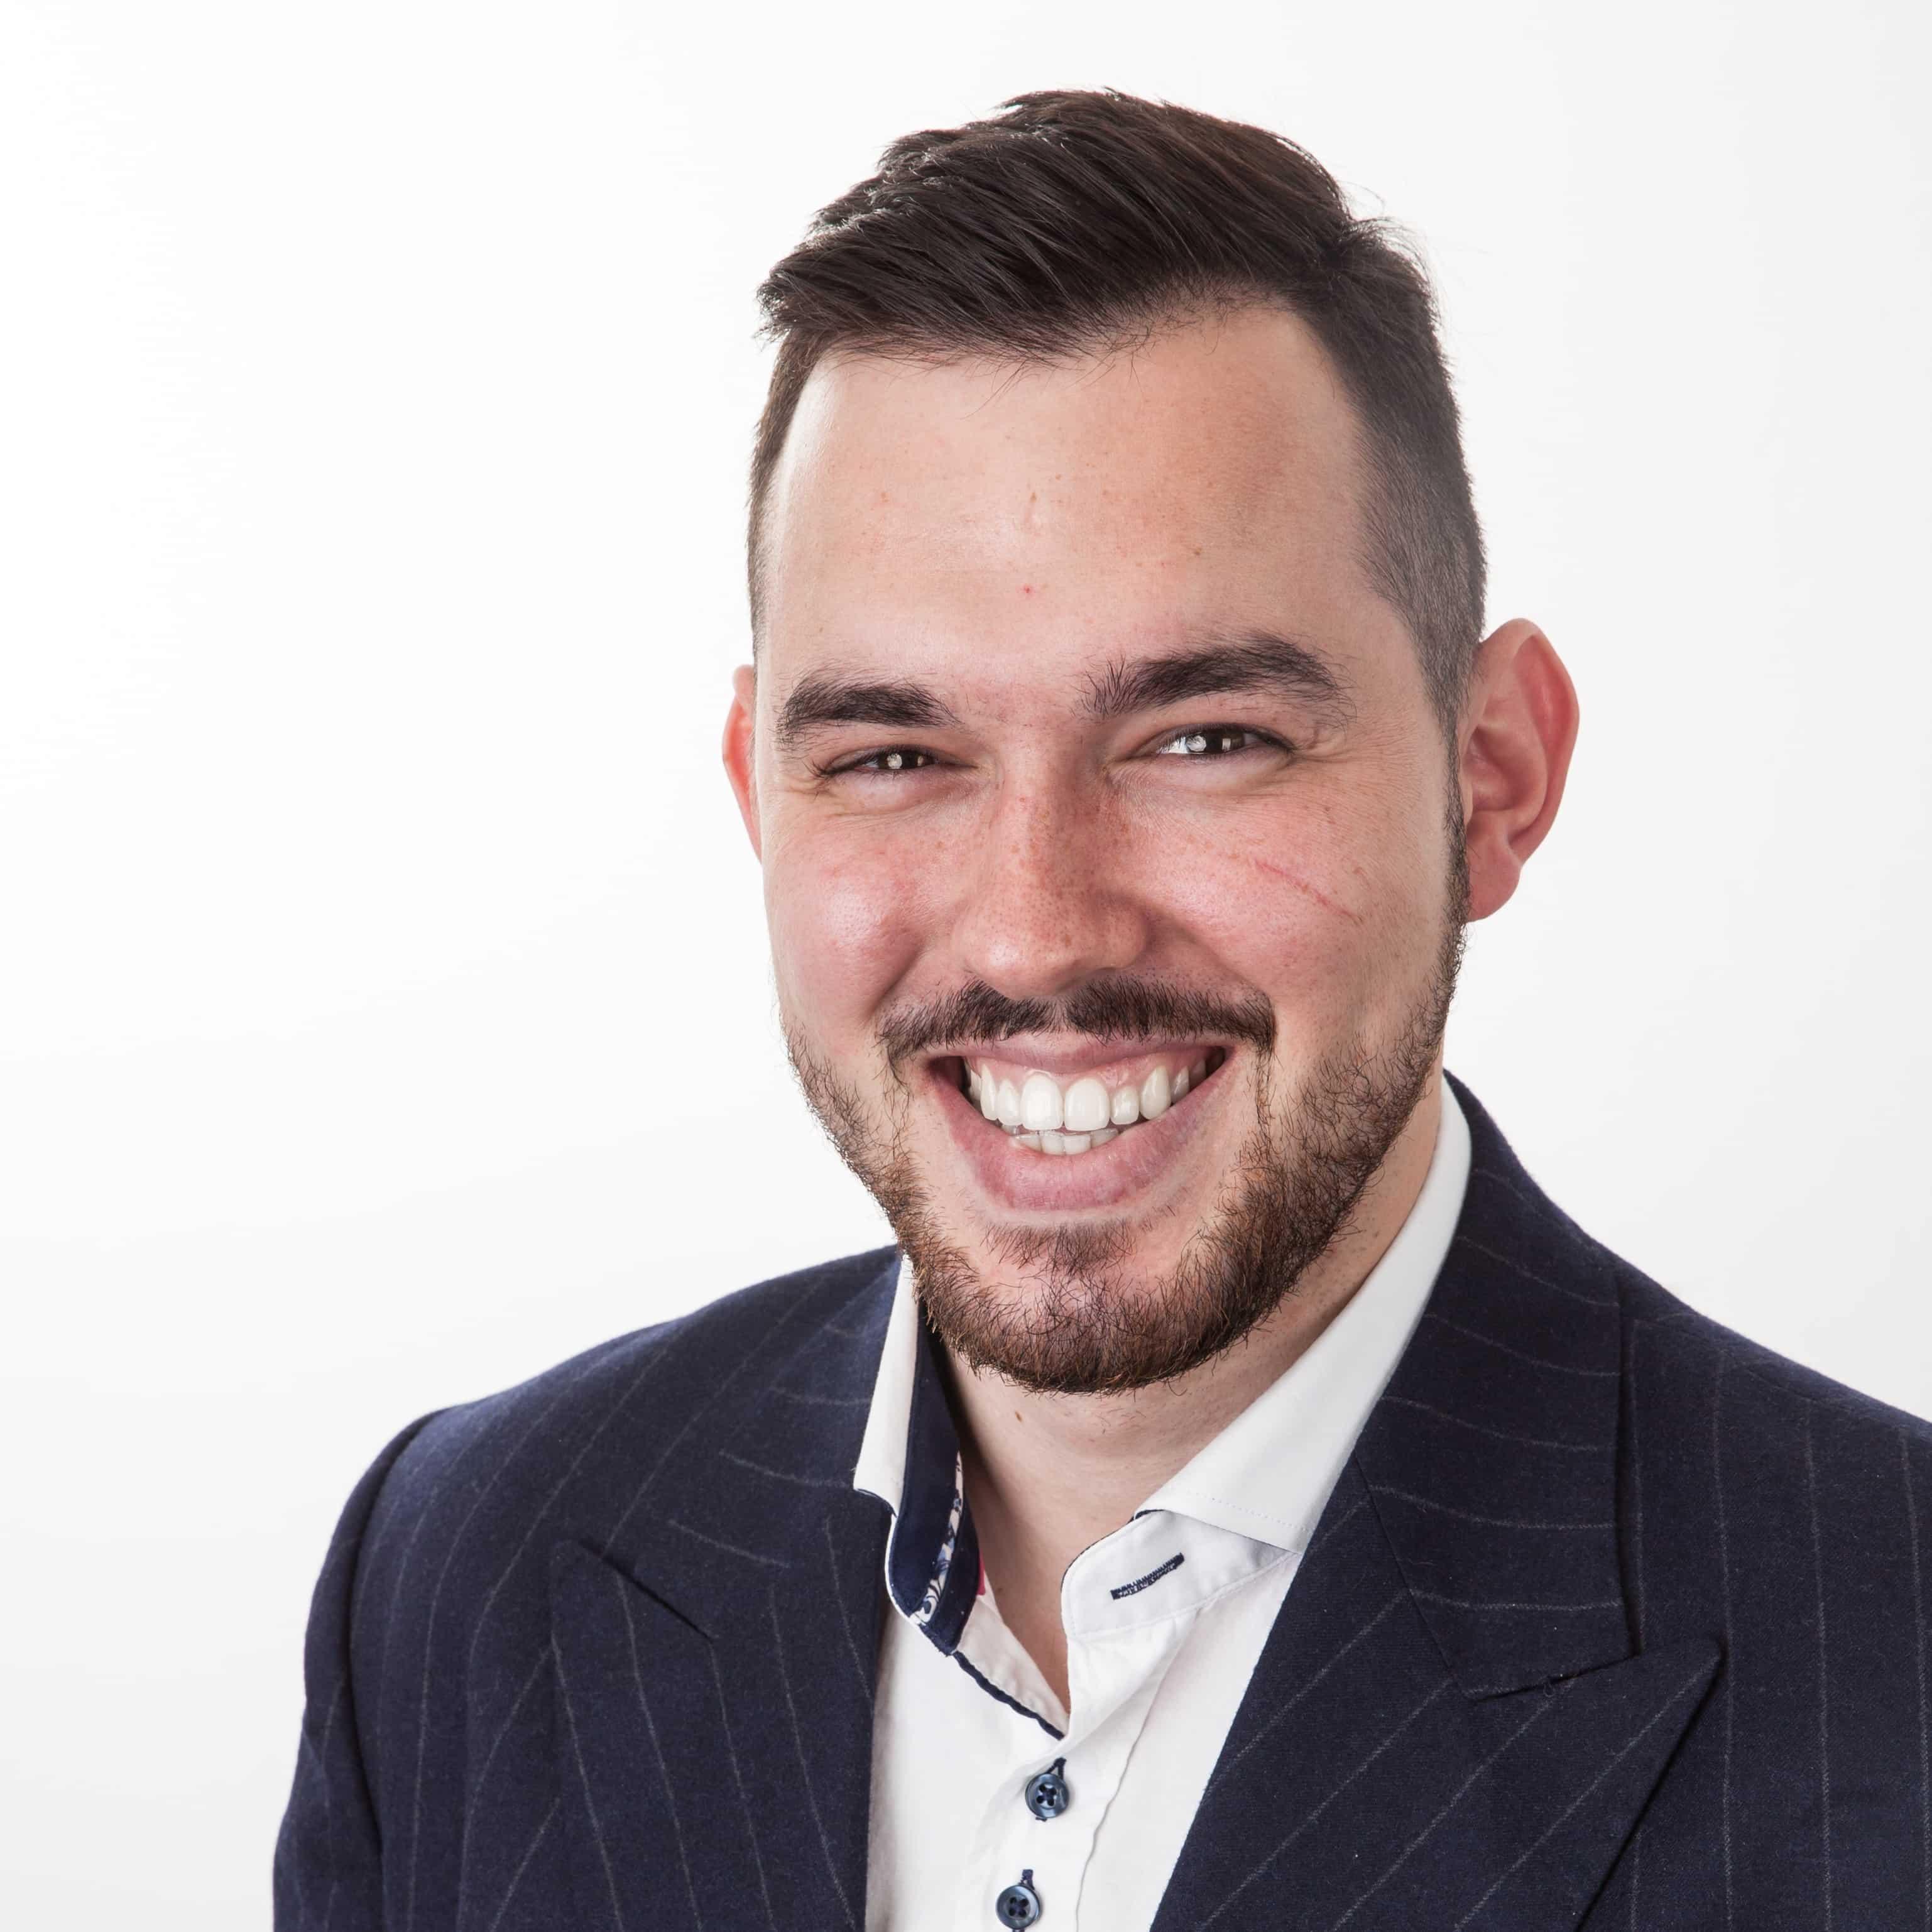 Filip Semrád, Business Development Manager